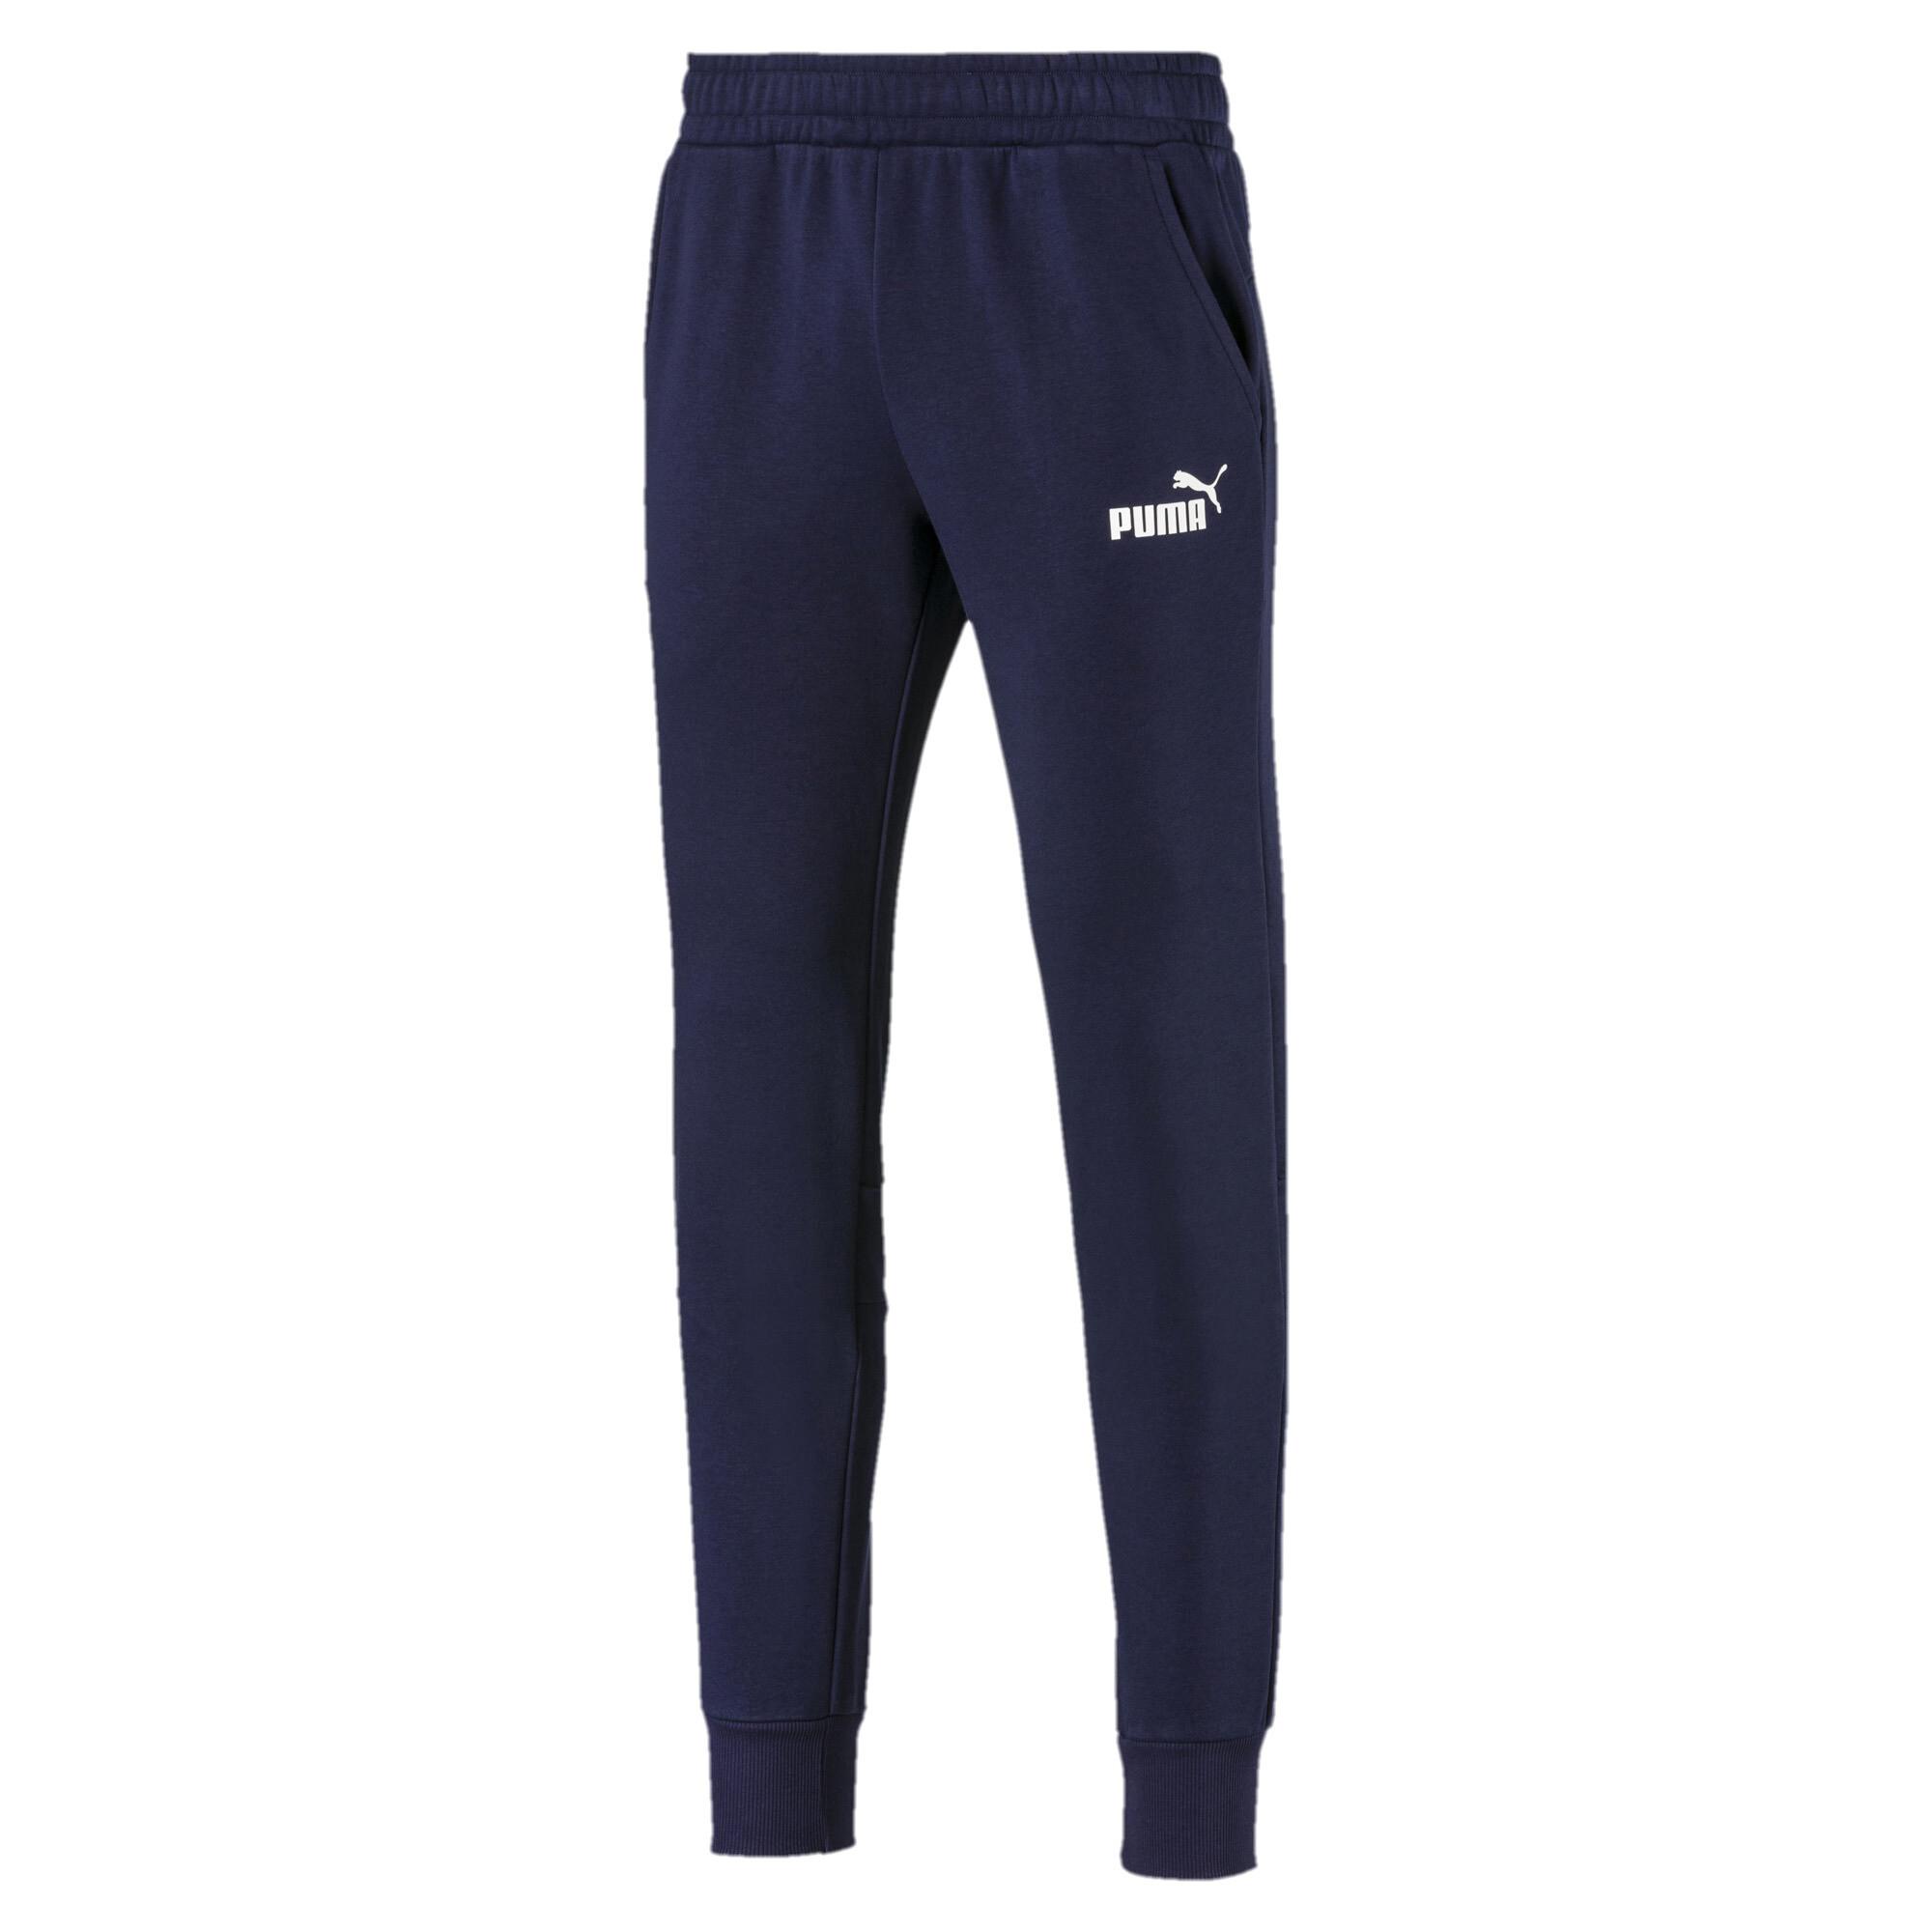 Image Puma Amplified Men's Sweat Pants #4